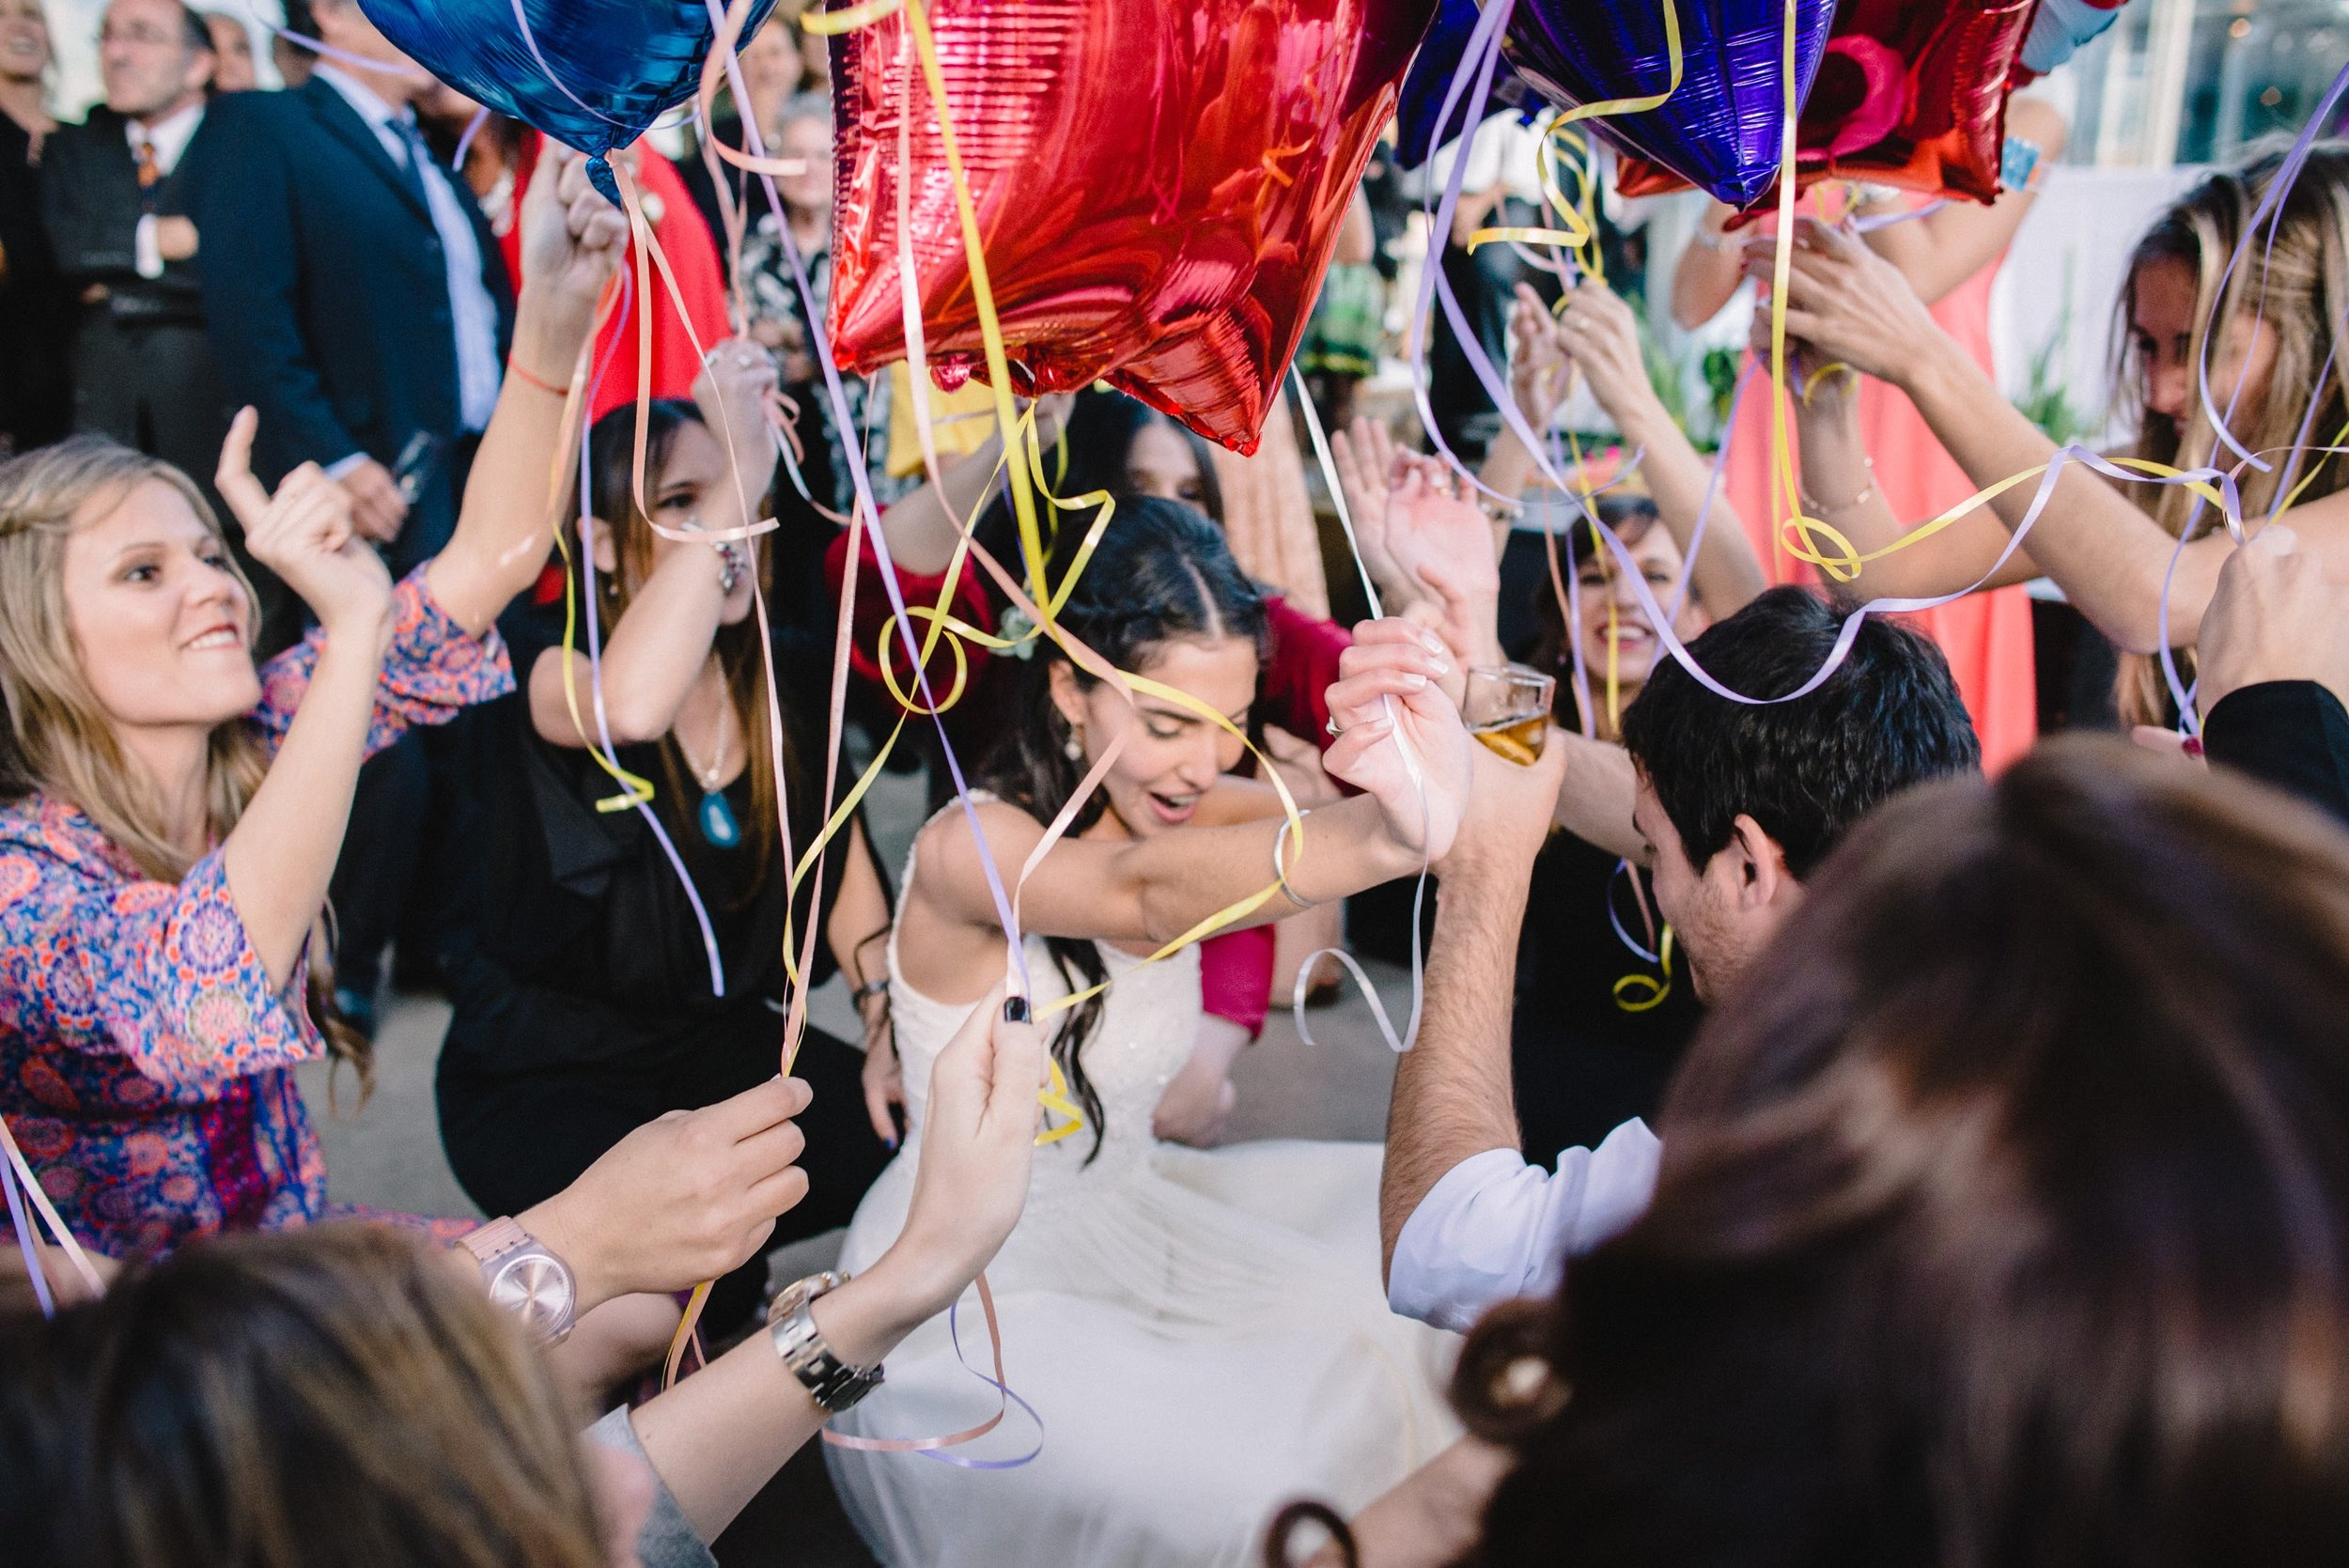 fotografo de bodas en carlos paz cordoba 075.JPG